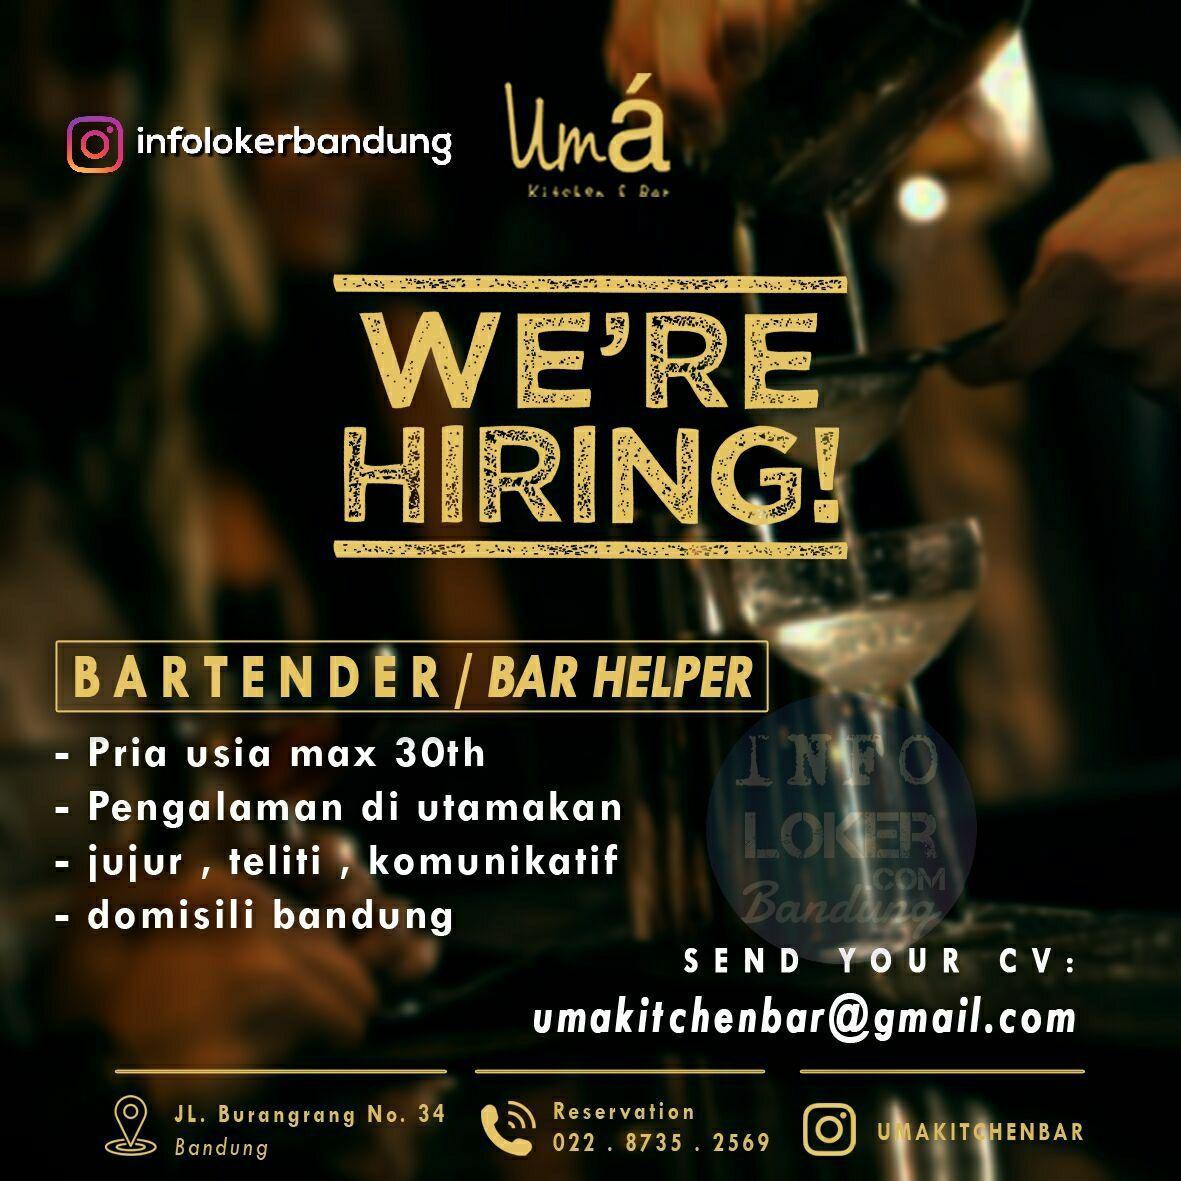 Lowongan Kerja Bartender / Bar Helper Uma Kitchen & Bar Februari 2018